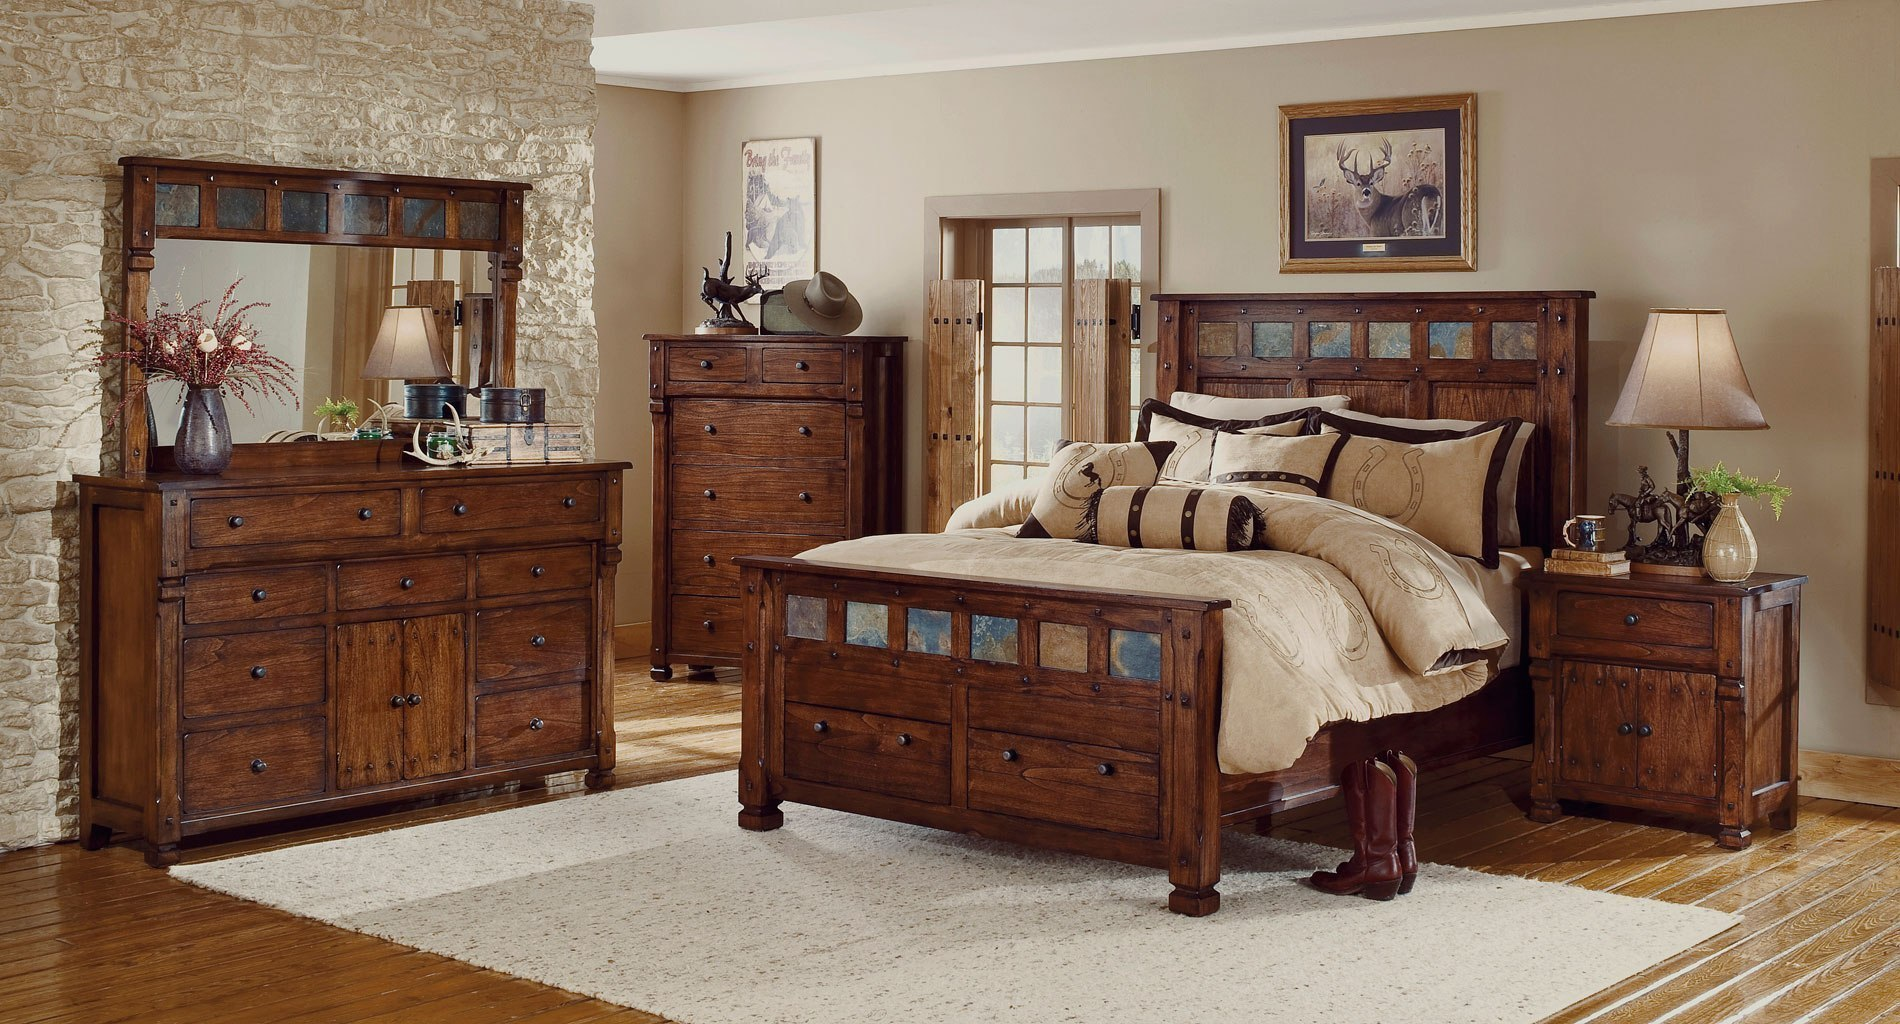 Santa Fe Storage Bedroom Set